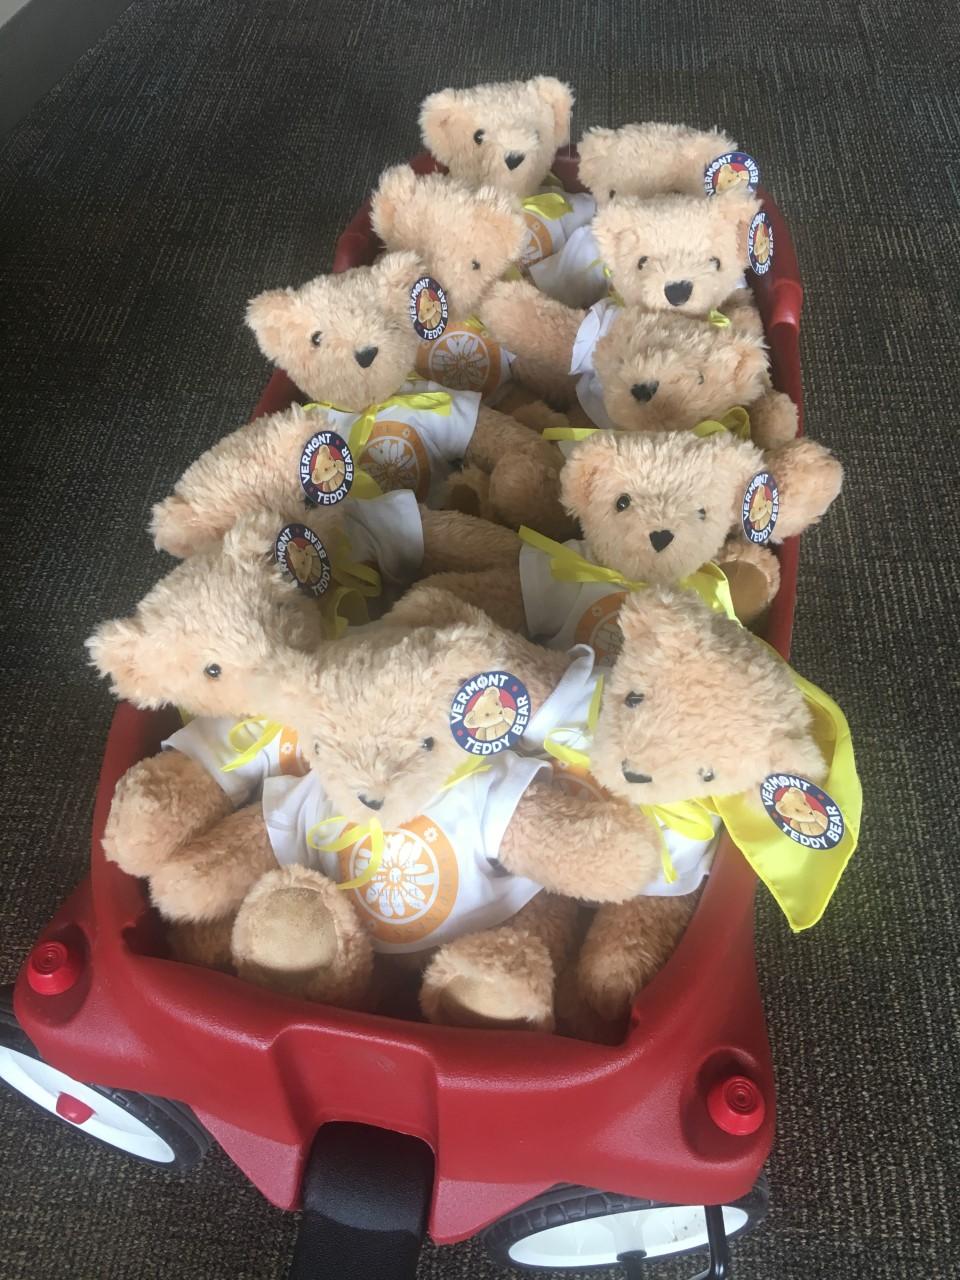 Teddy bear_1558650889704.jpg.jpg